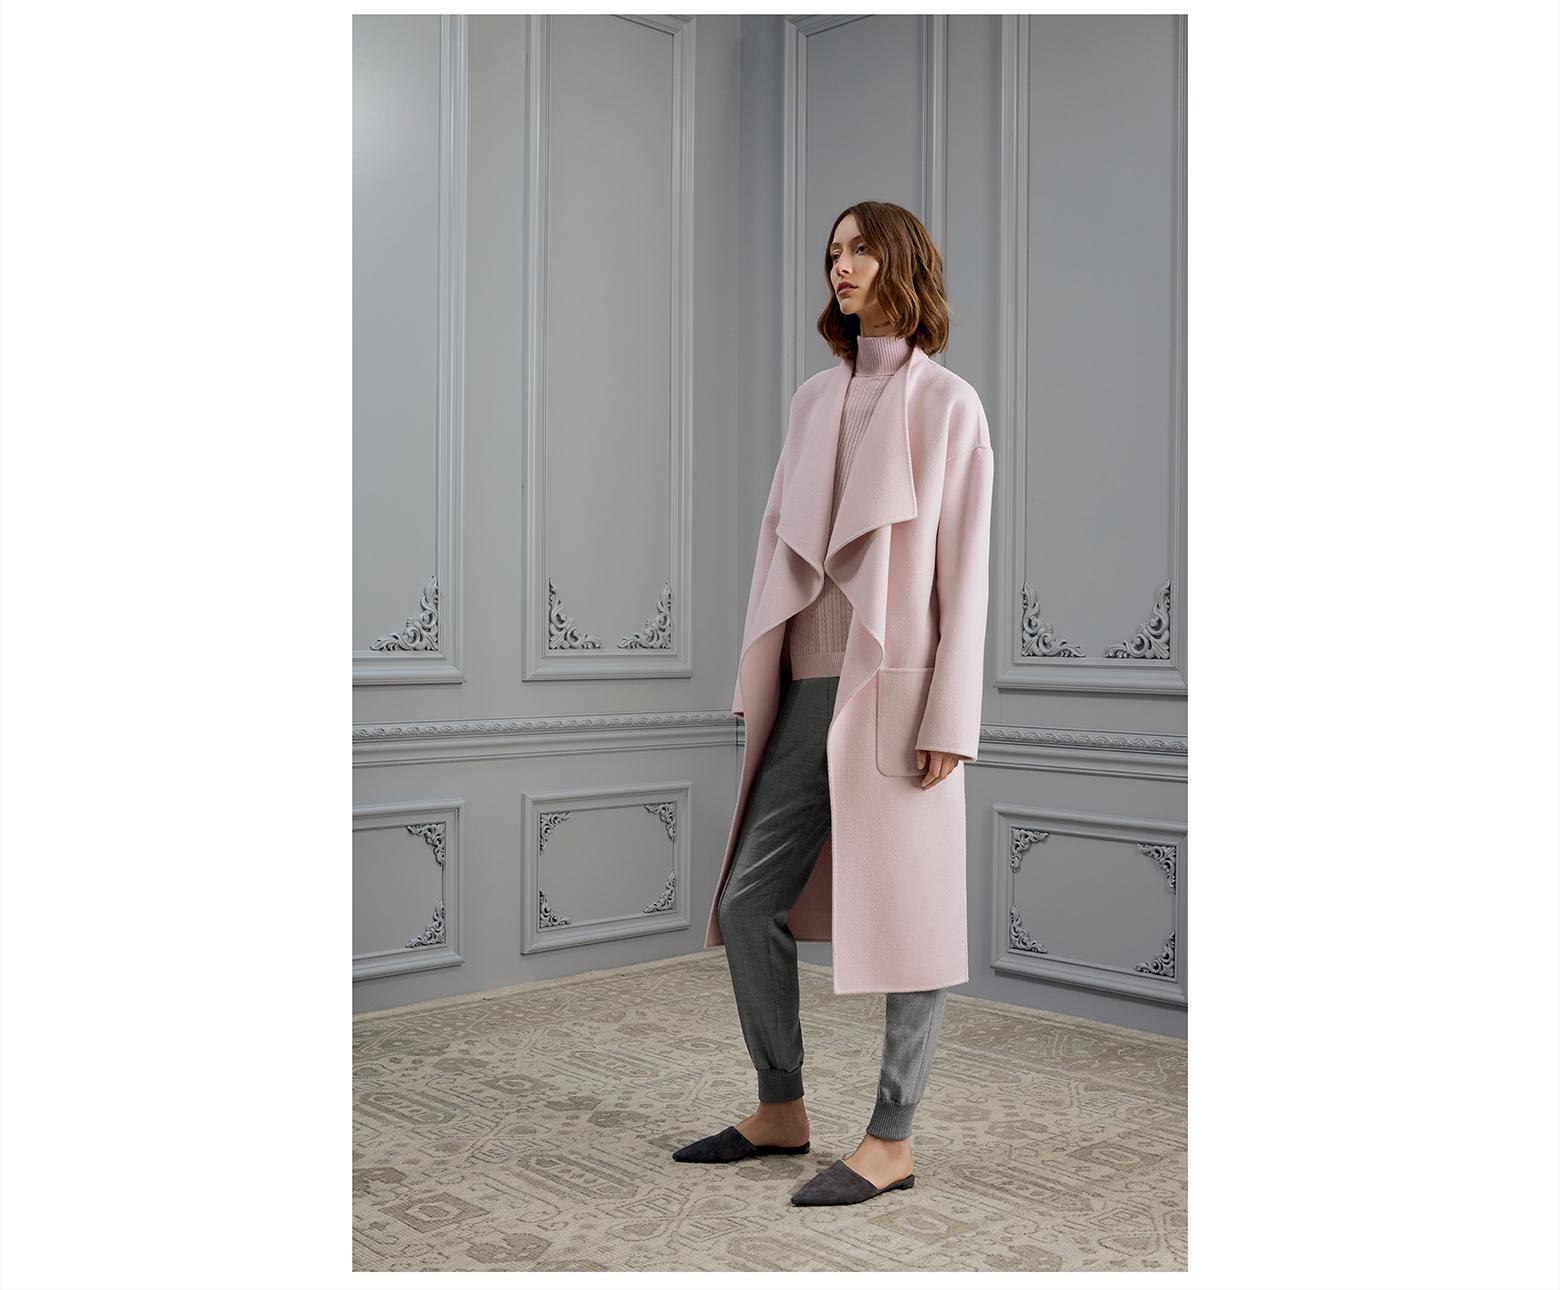 Model dressed in Saint John pink cashmere coat